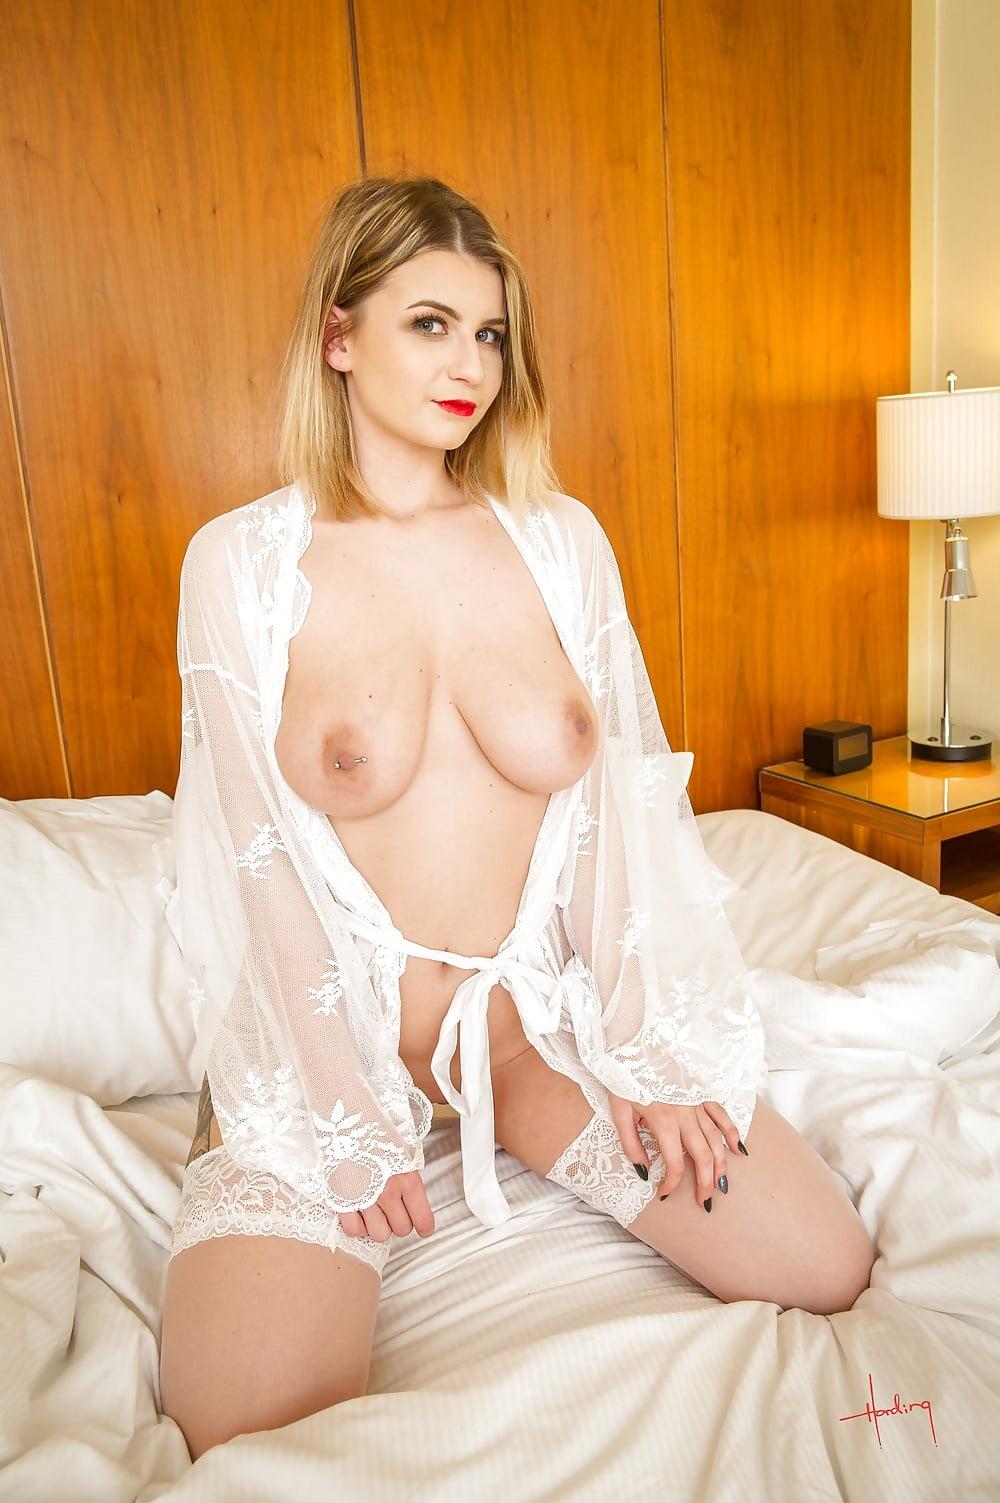 rubia sexy en la cama desnuda esperando por sexo